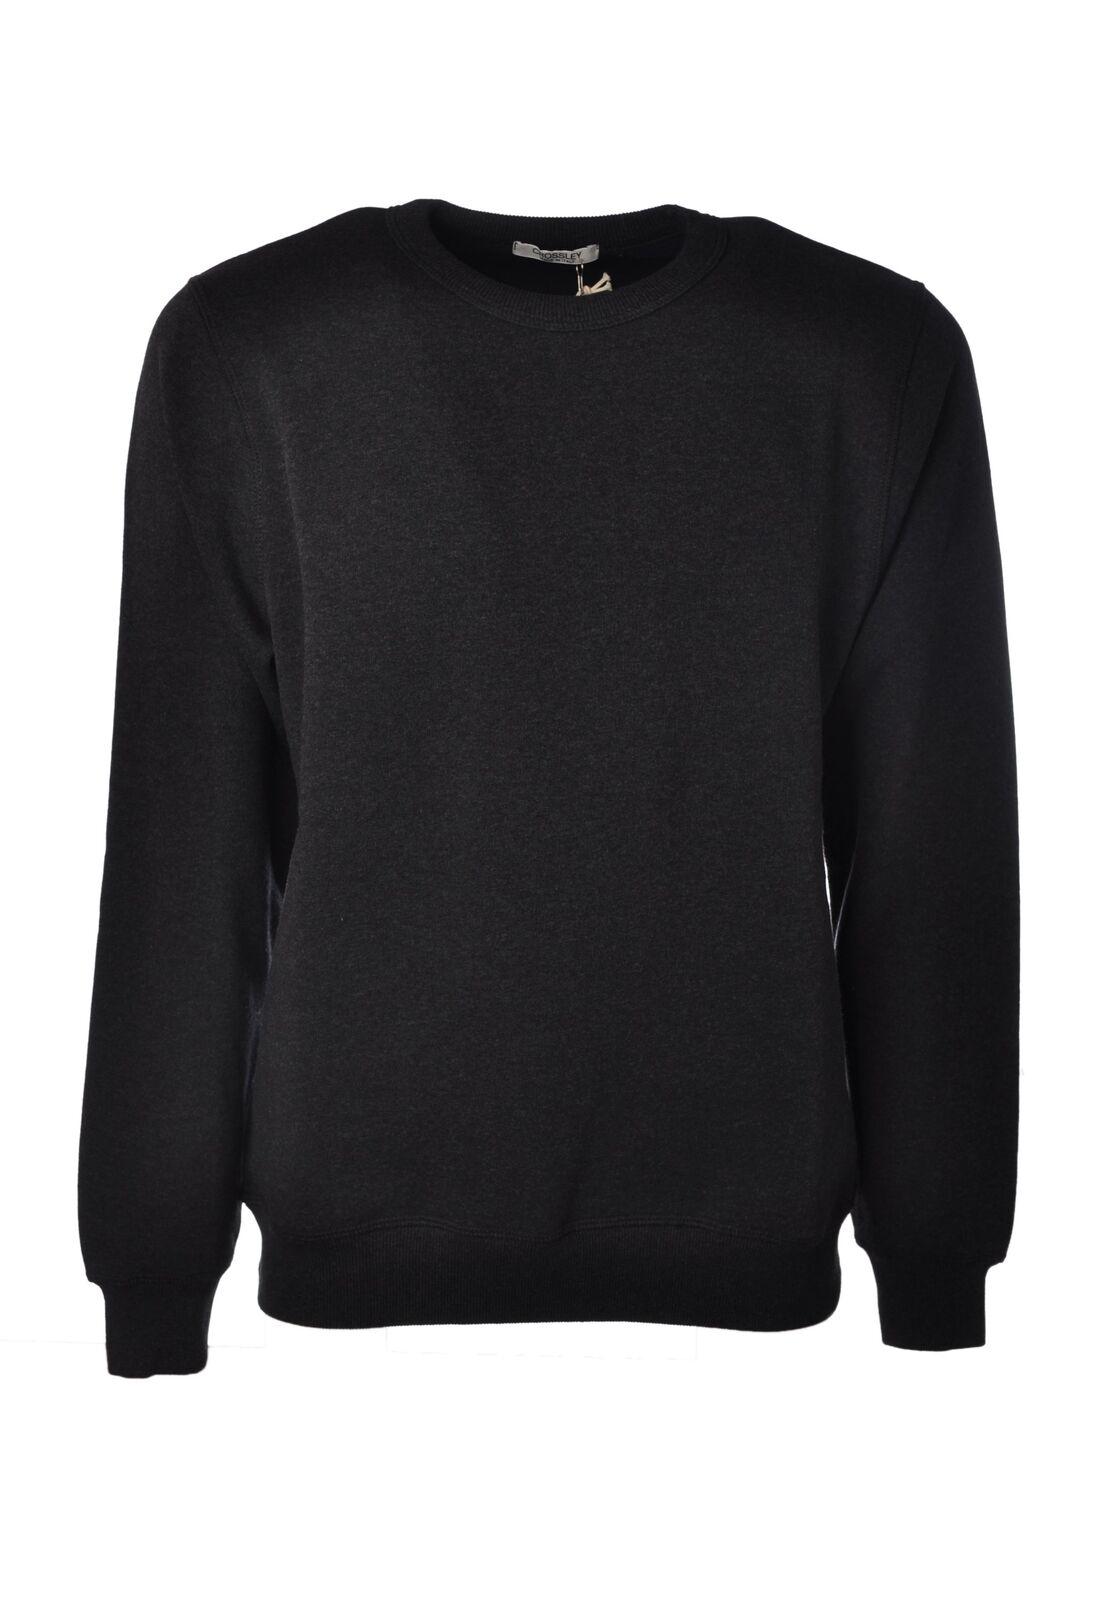 CROSSLEY  -  Sweaters - Male - Grau - 4088429A182336